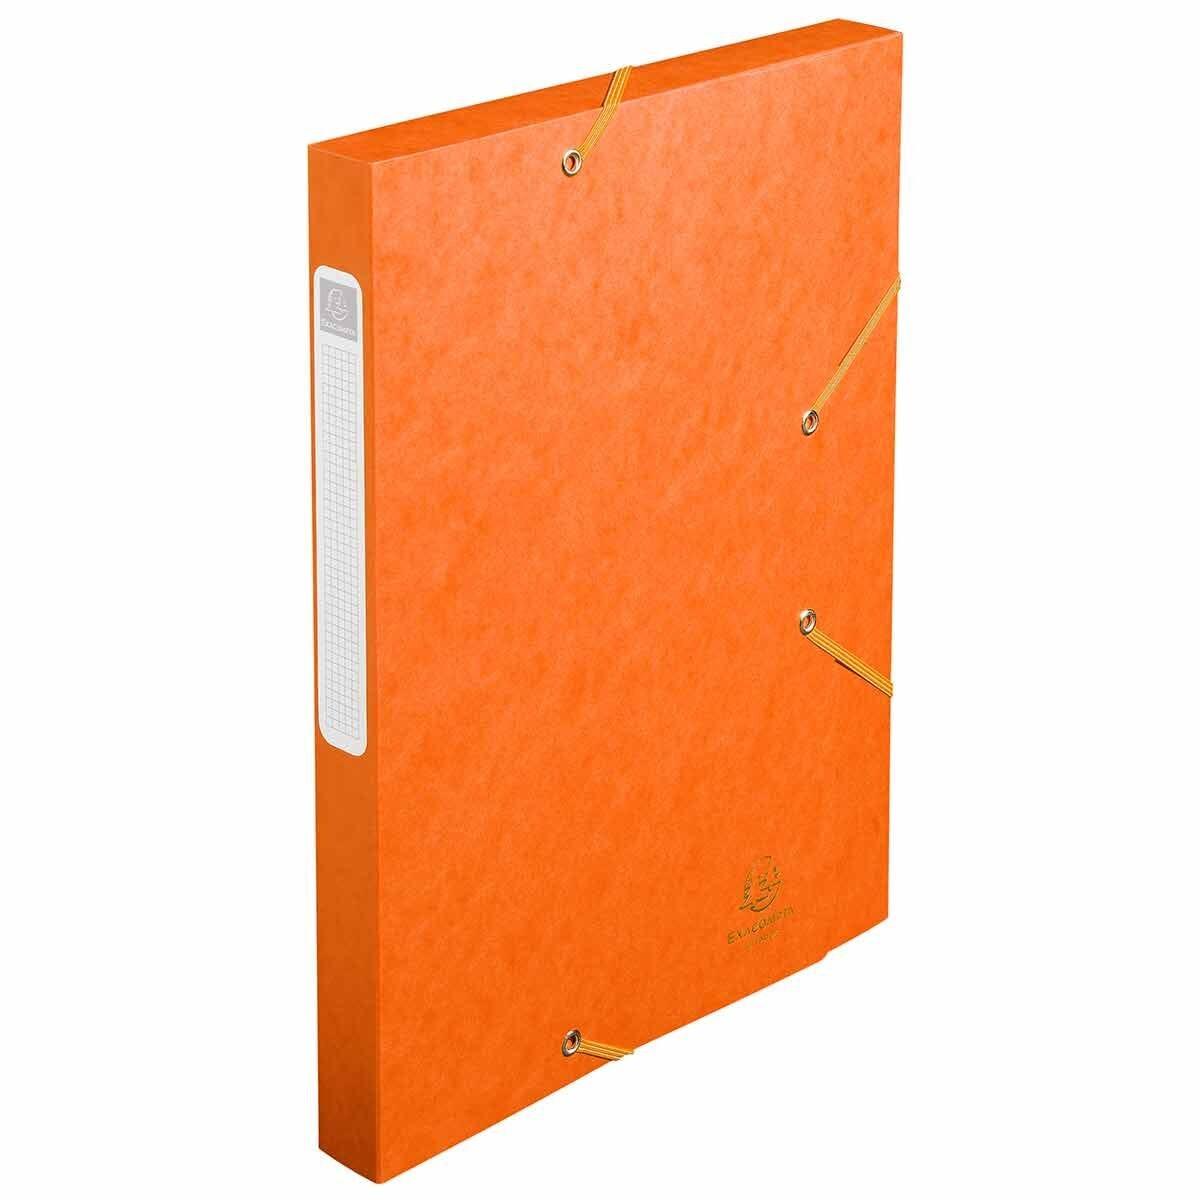 Exacompta Cartobox Box File 25mm 400g A4 Pack of 25